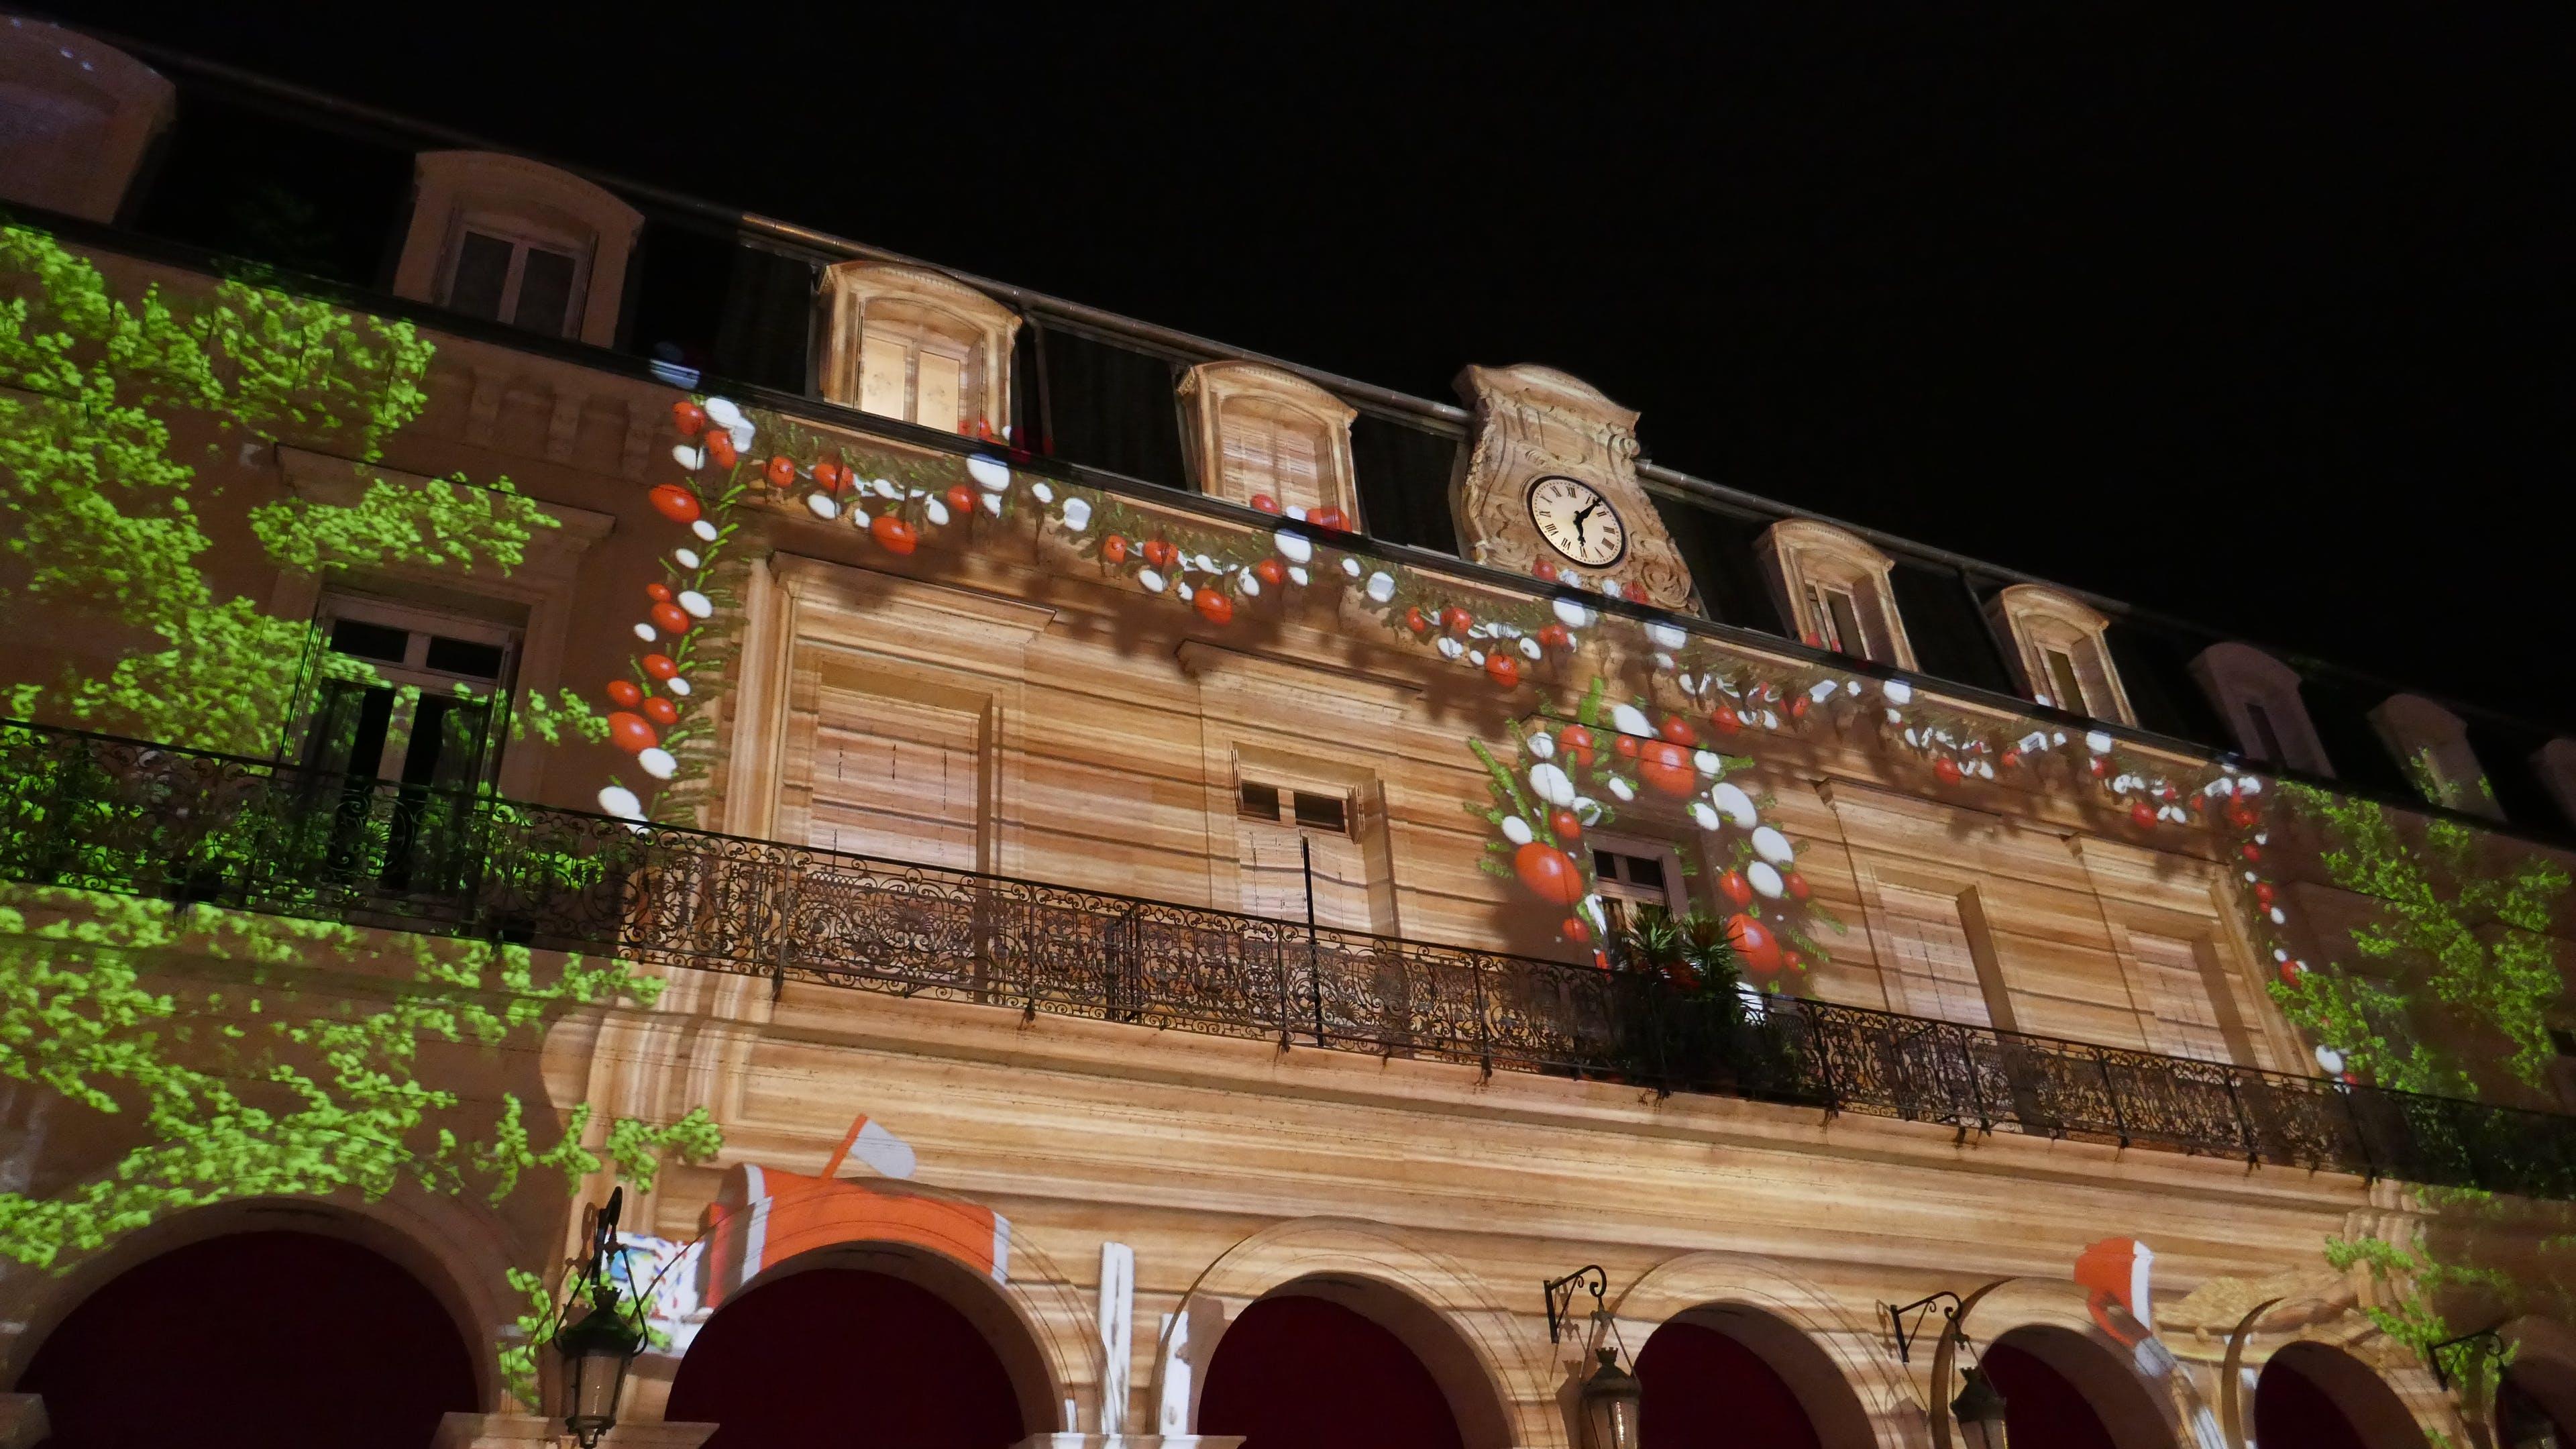 Free stock photo of Christmas magics, fantastic, light show on facades, night lights